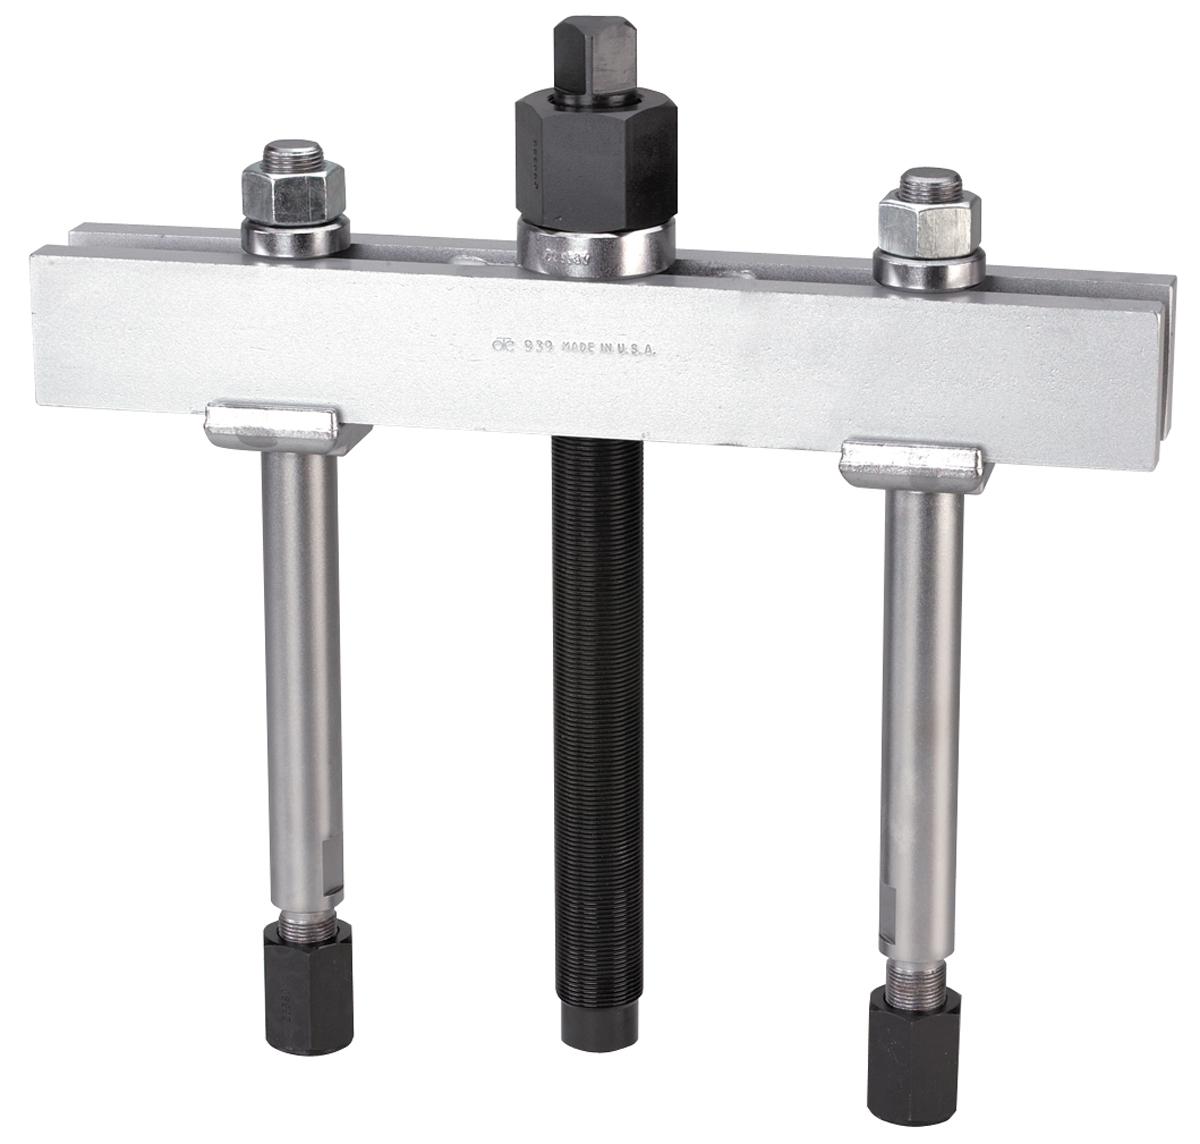 Zim Gear Puller : Ton push puller otc tools